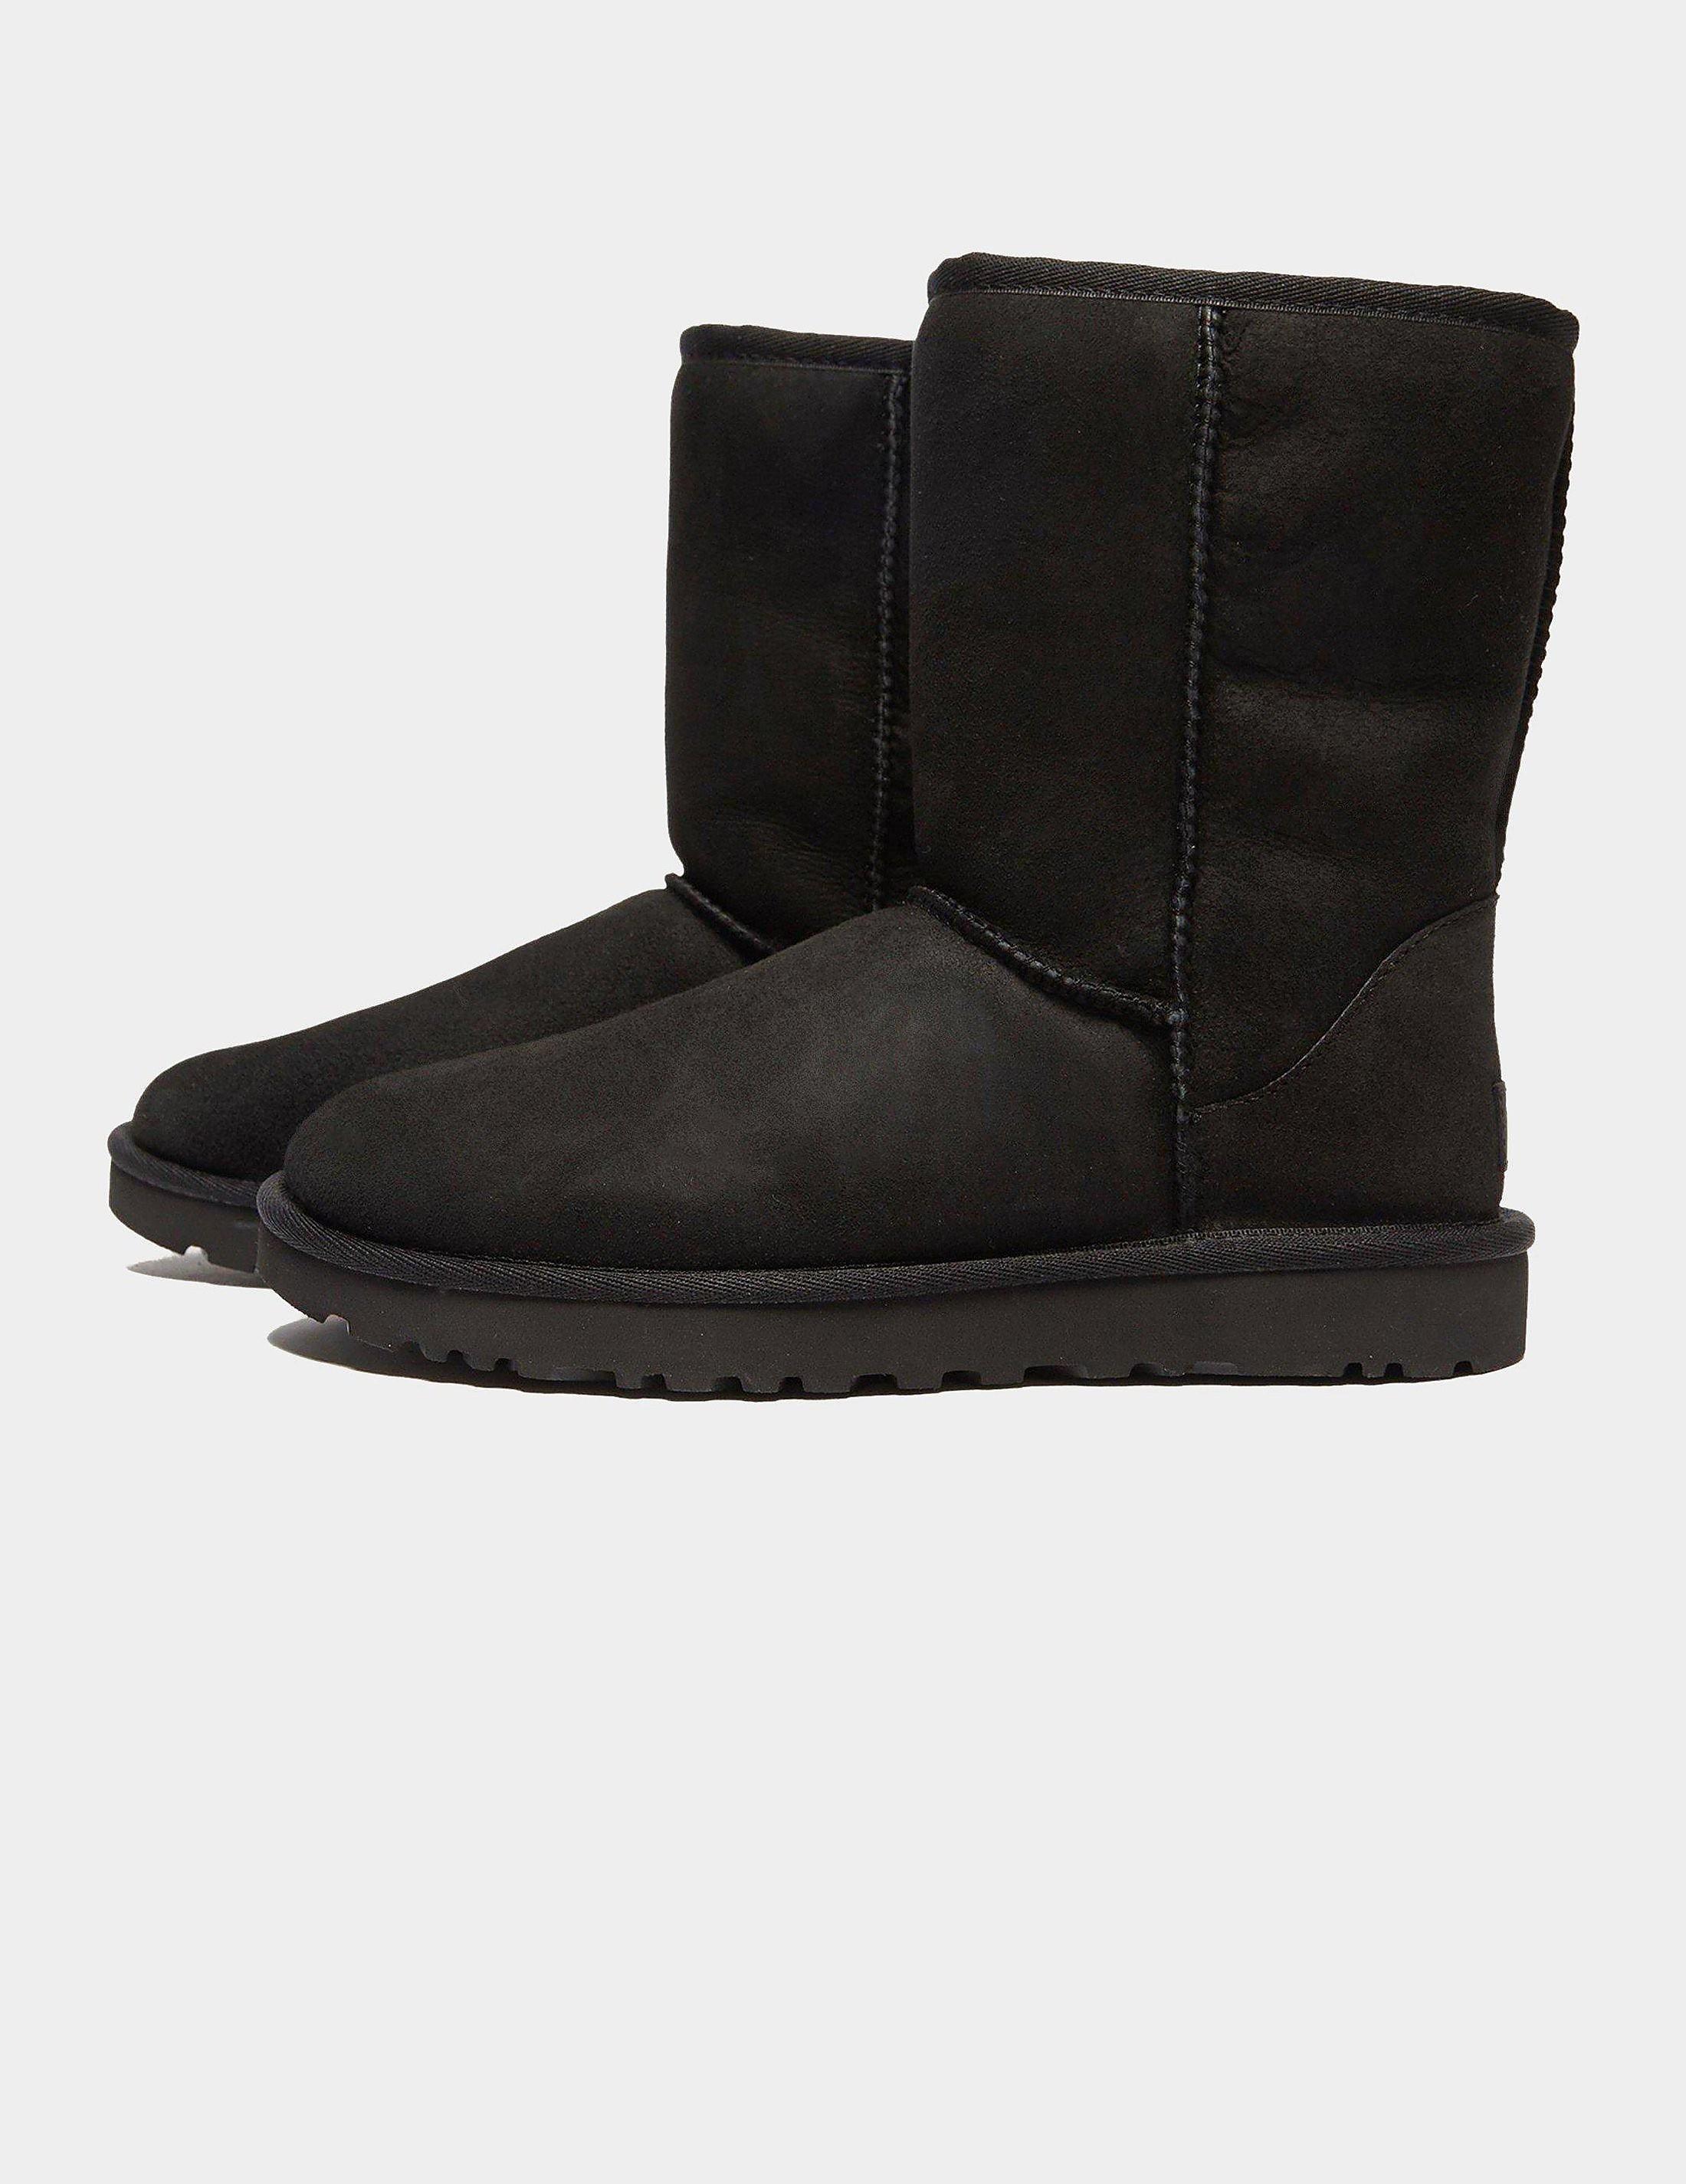 UGG Classic Short2 Boot